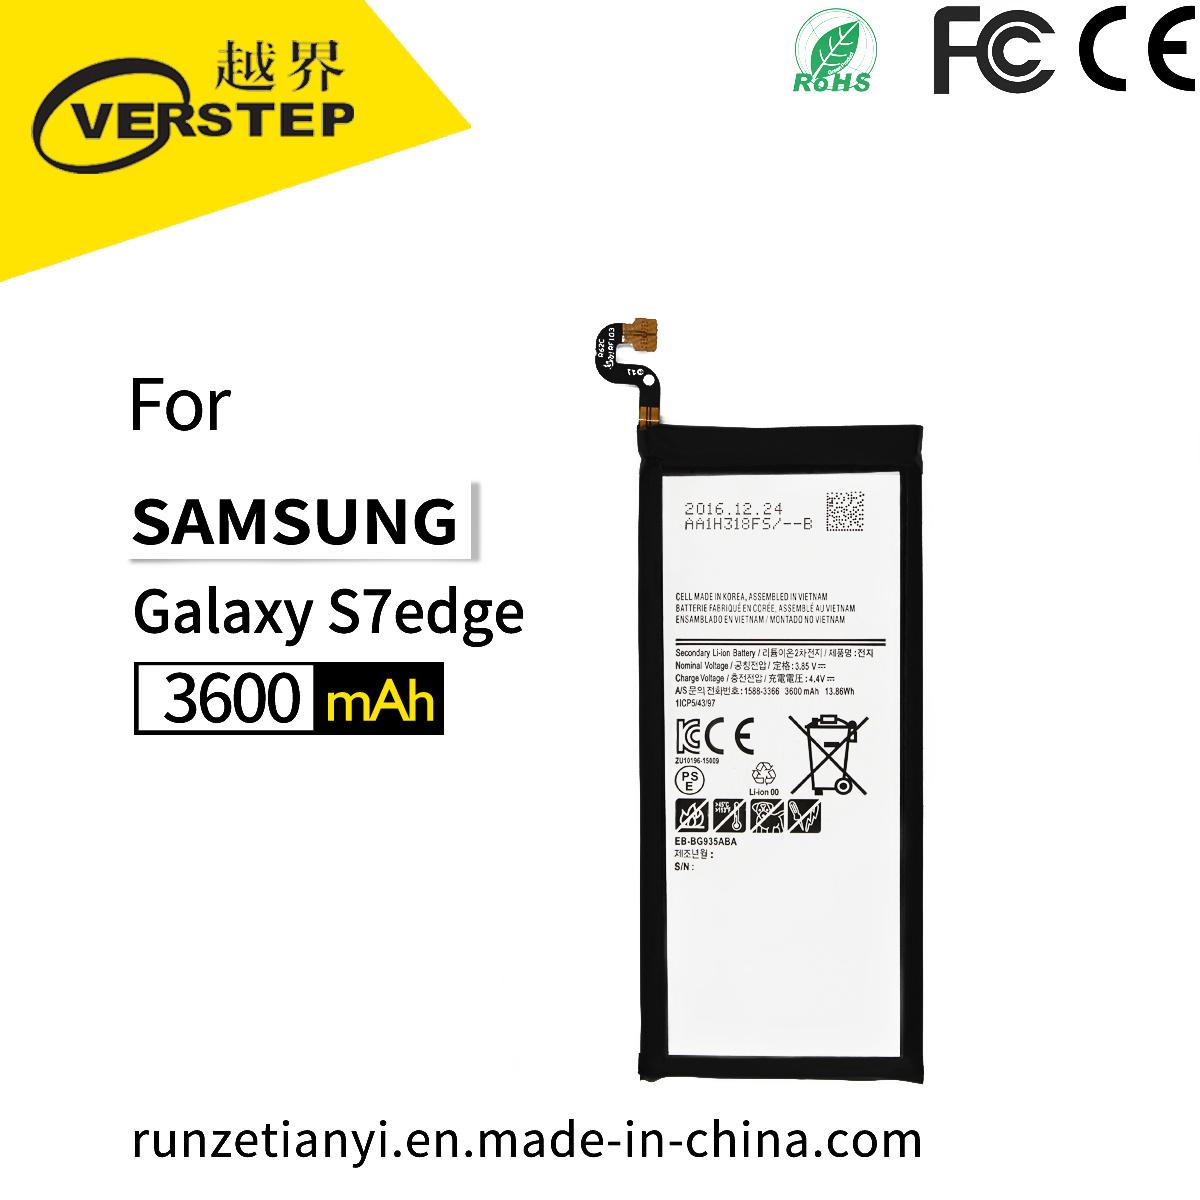 China Internal Mobile Phone Batteries 3600mah Eb Bg935aba Bg935abe Samsung Galaxy Note 2 Original Battery For S7 Edge